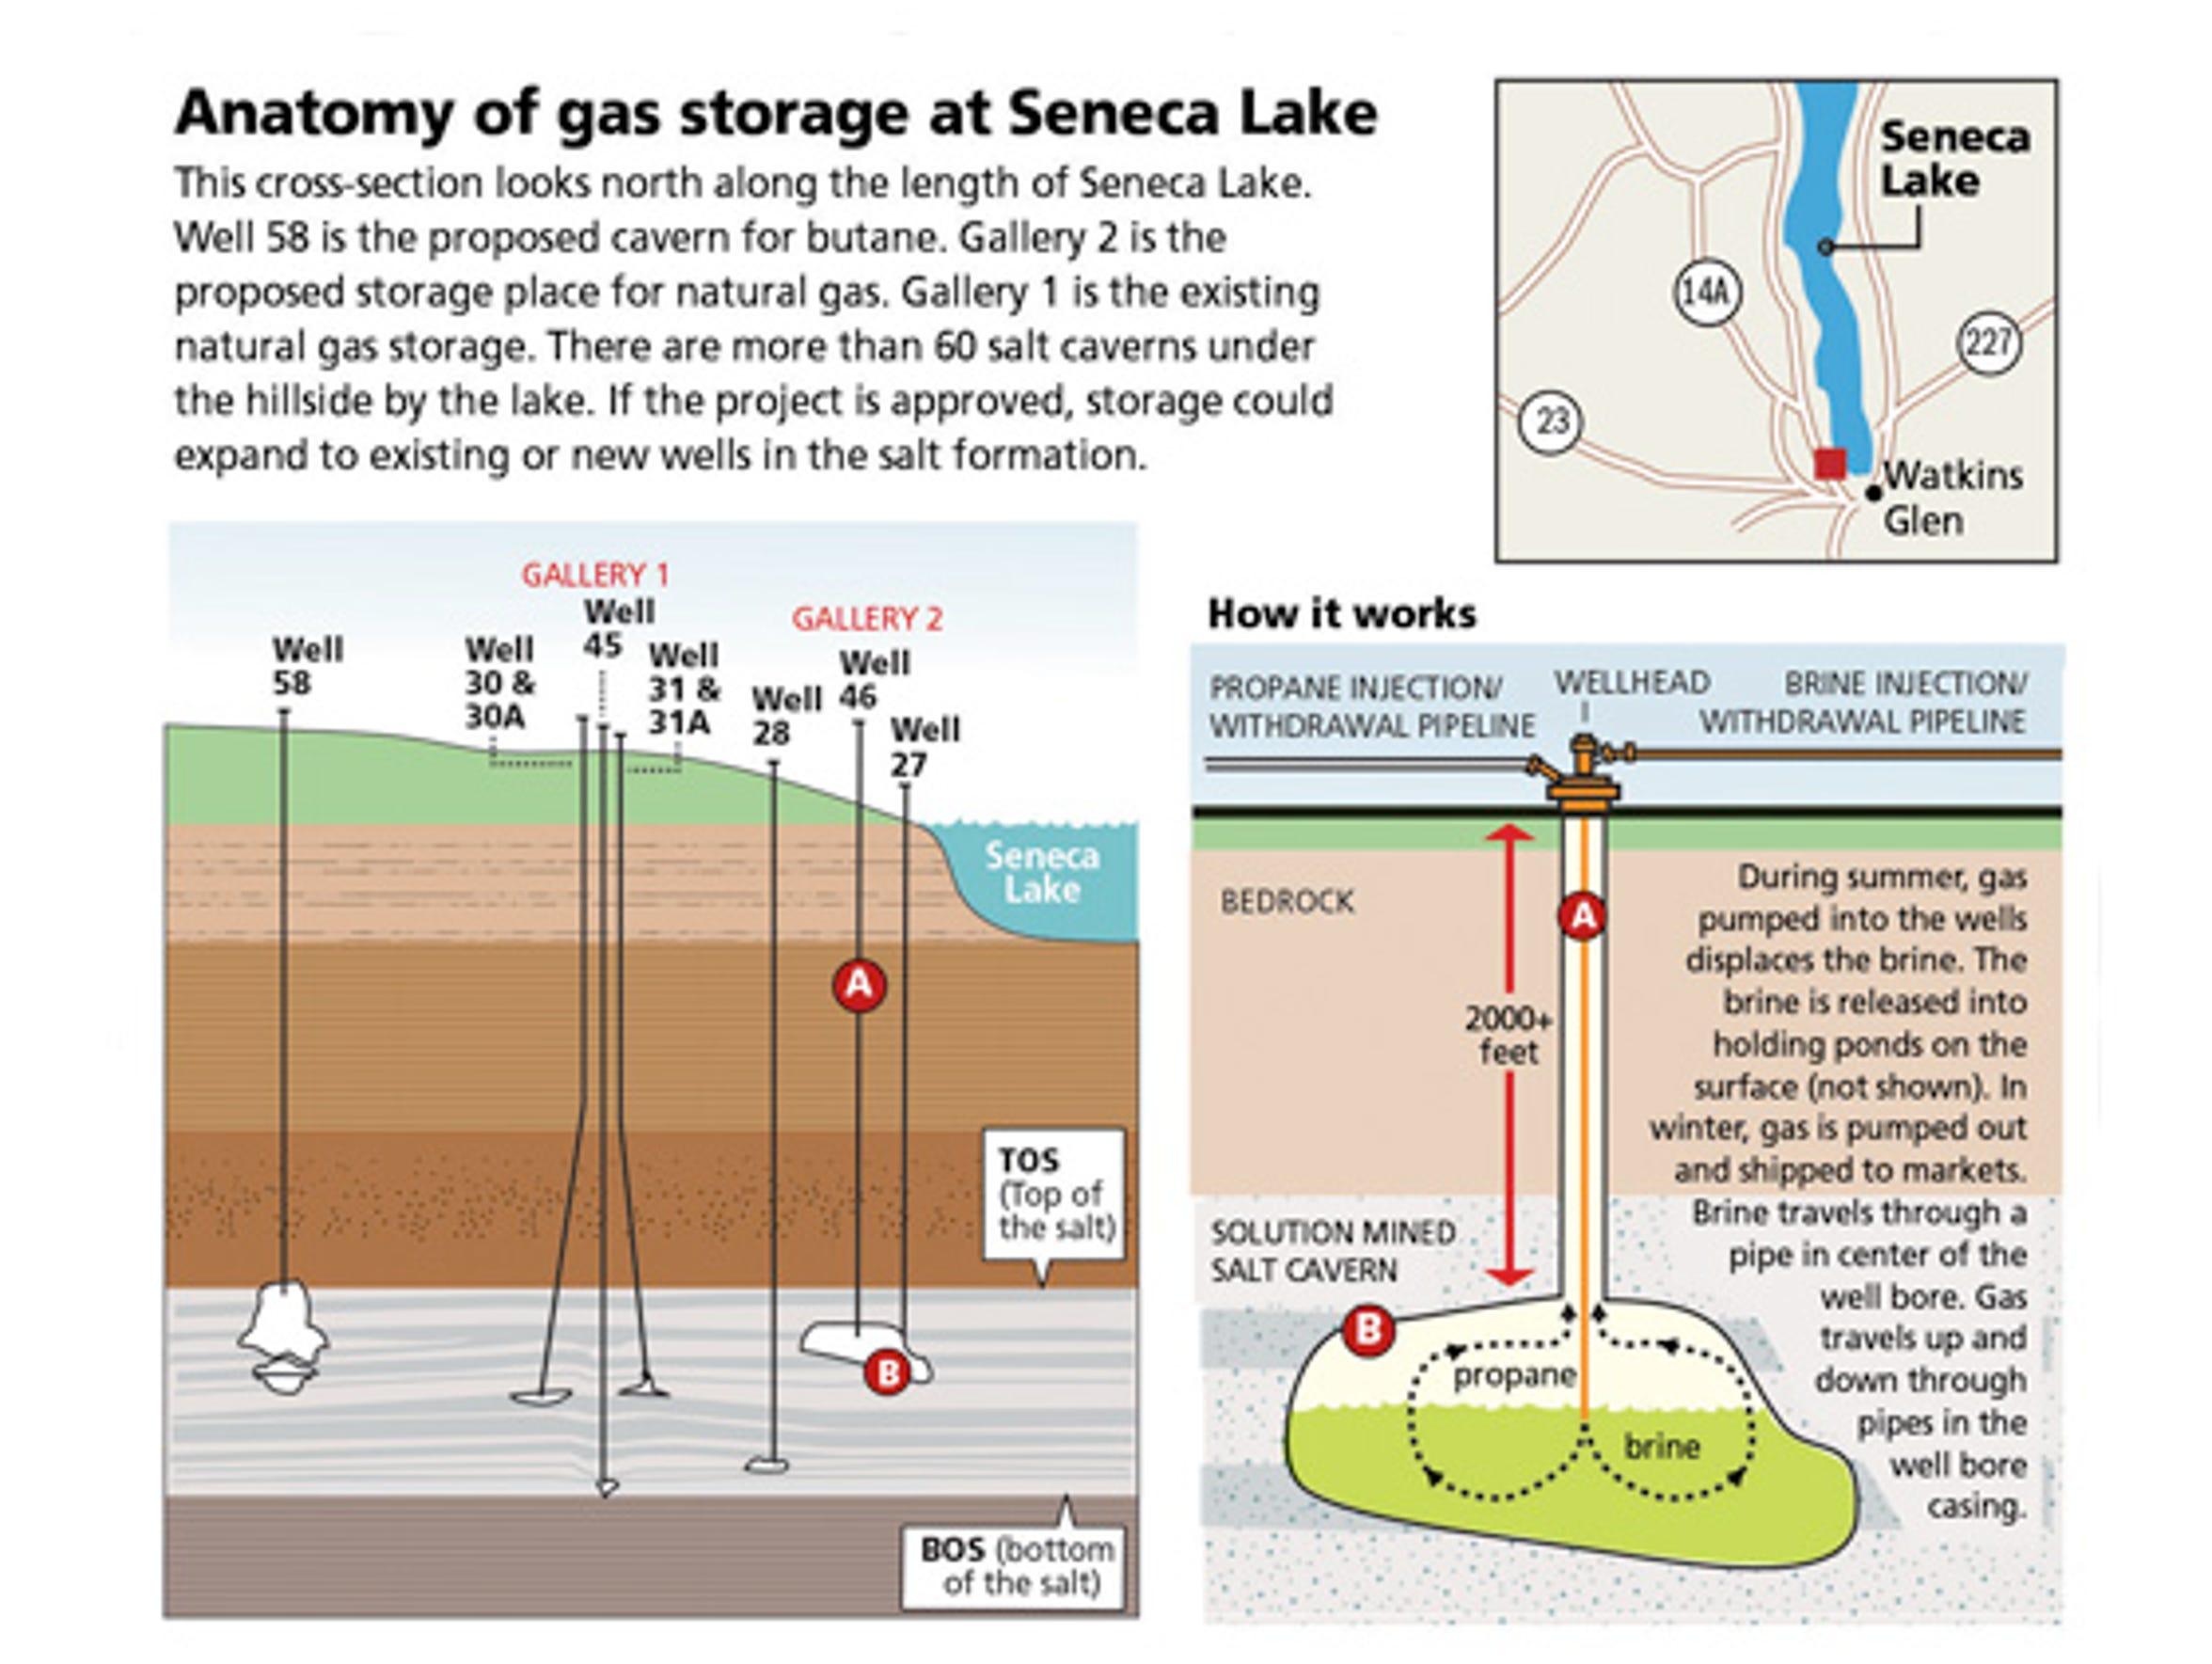 Anatomy of Seneca gas storage.